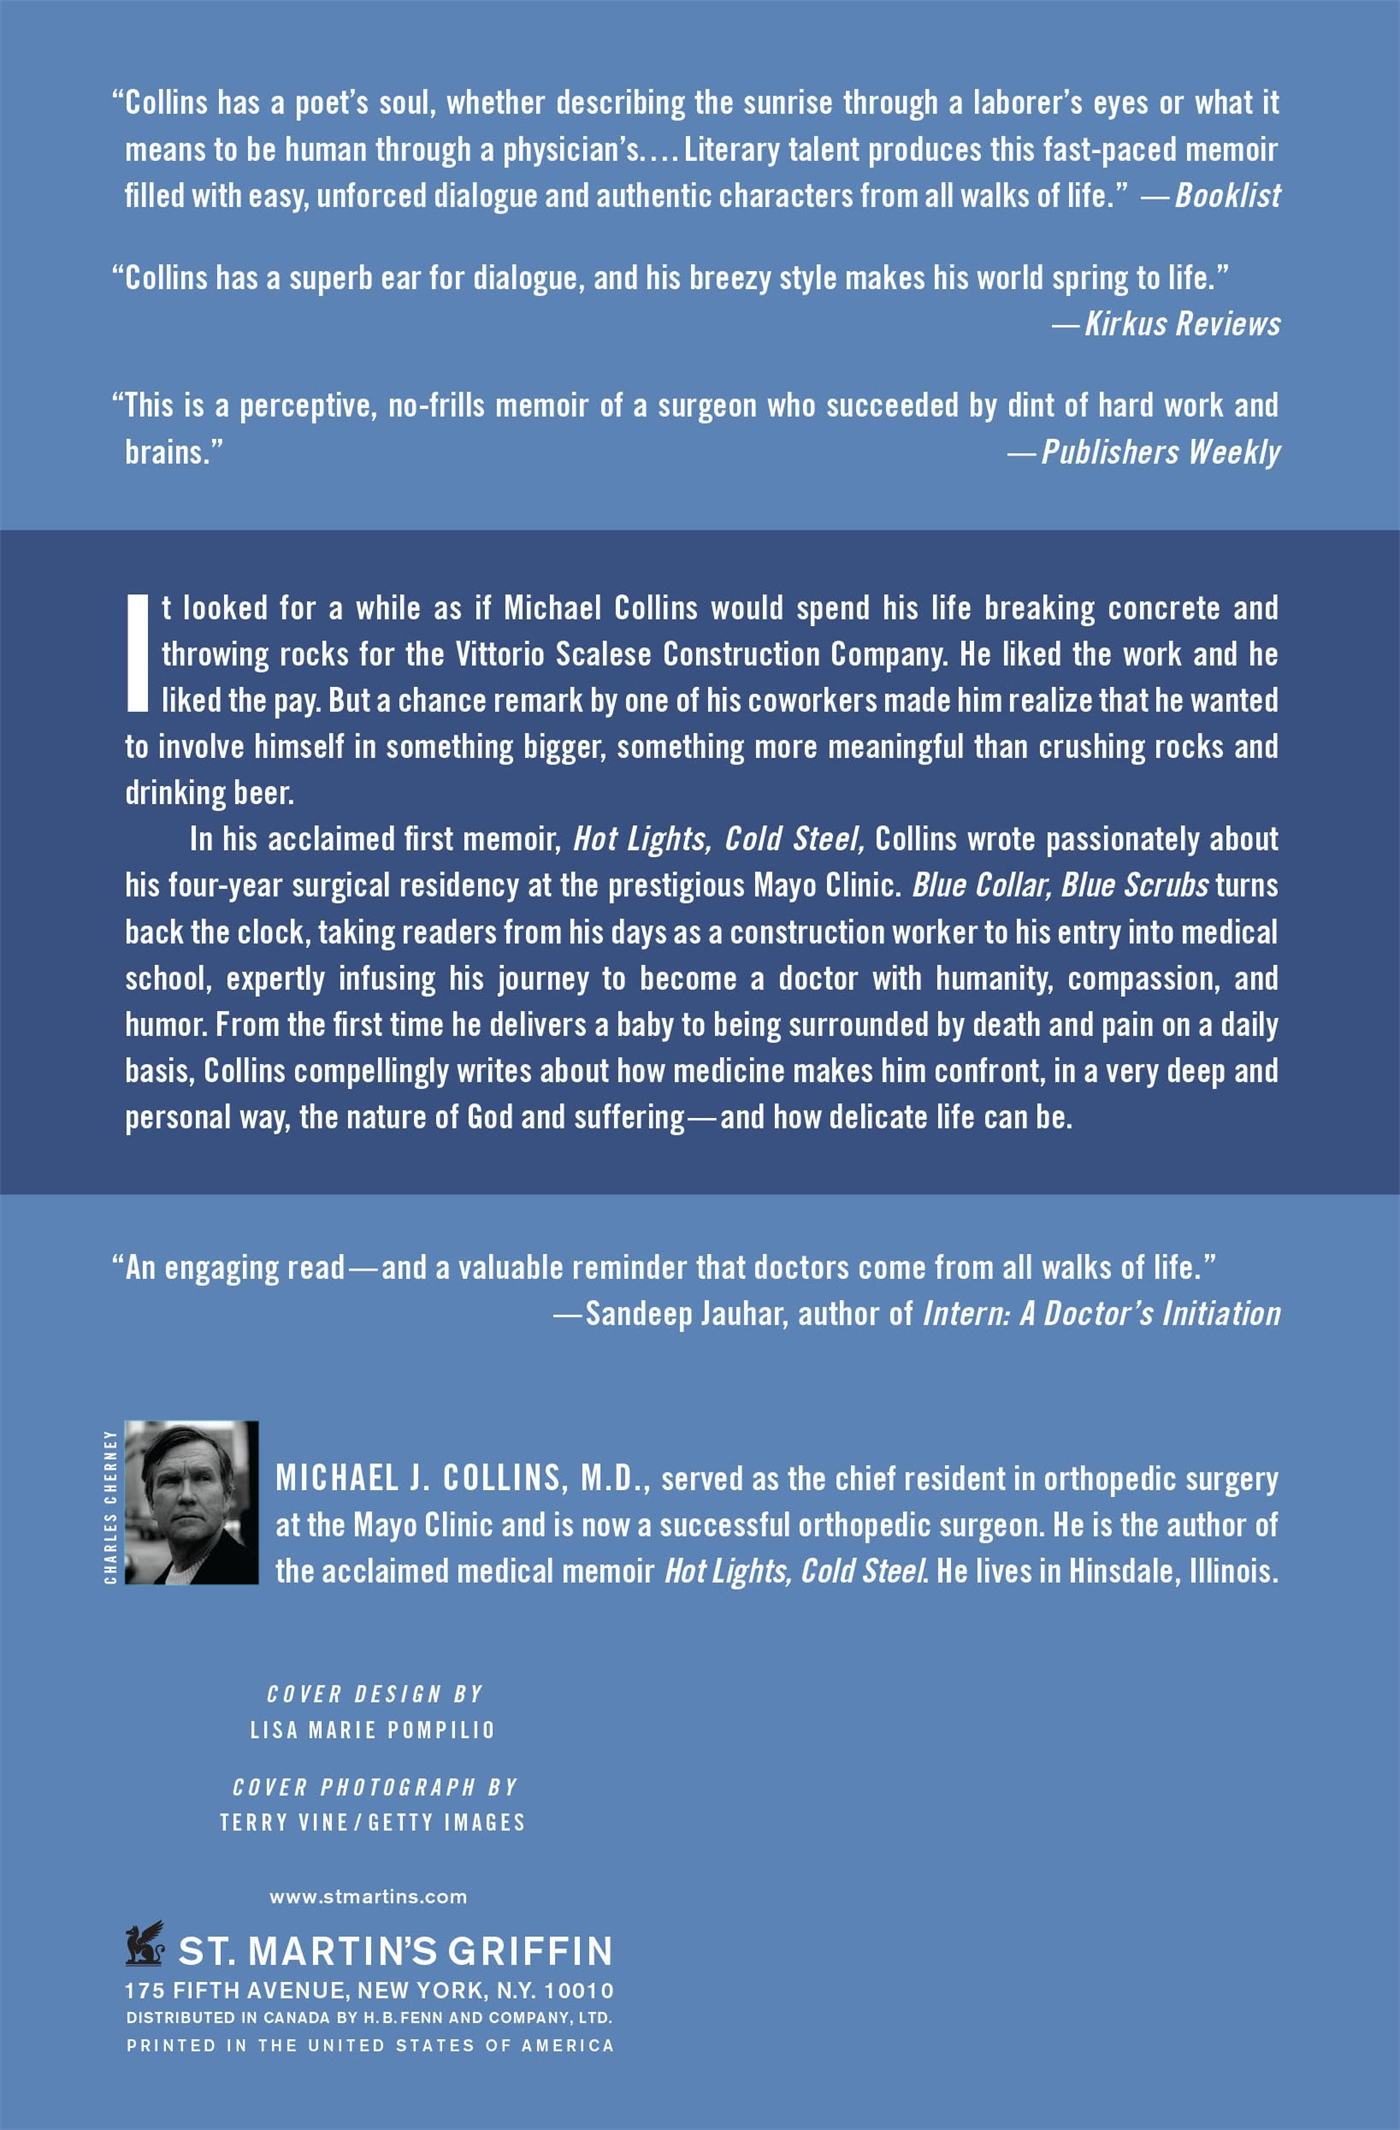 Blue Collar, Blue Scrubs : The Making of a Surgeon